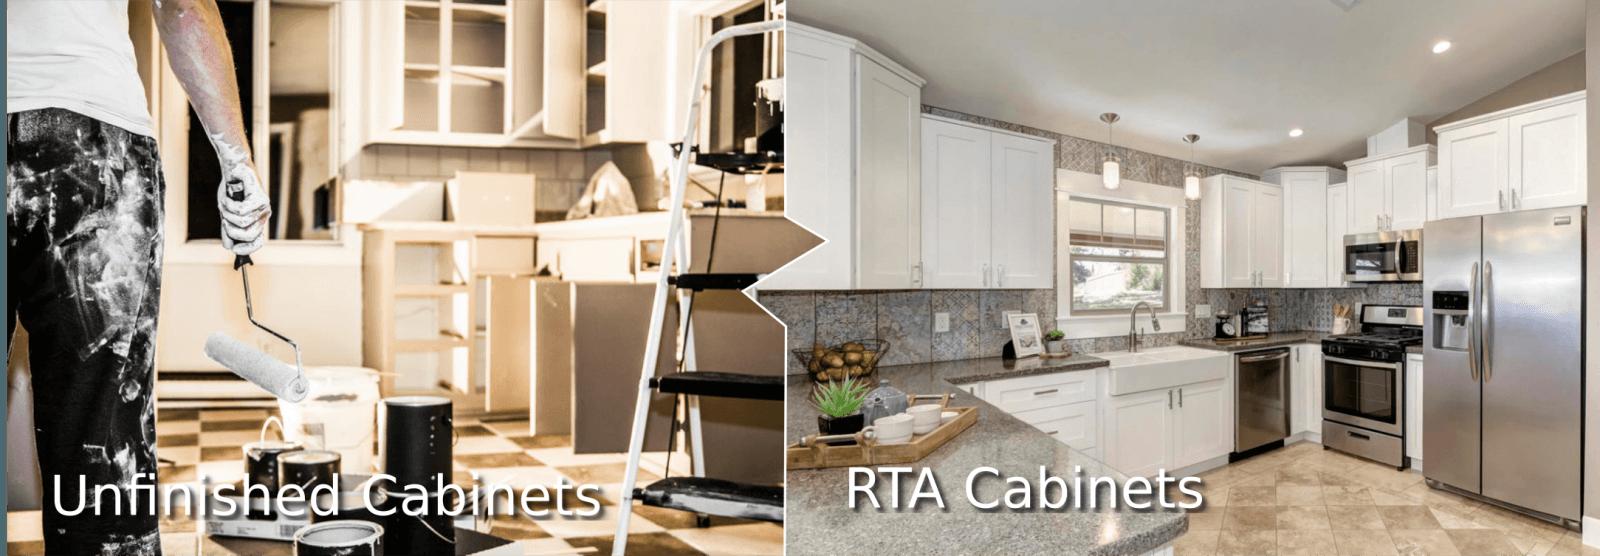 unfinished-Vs-Rta-Cabinets